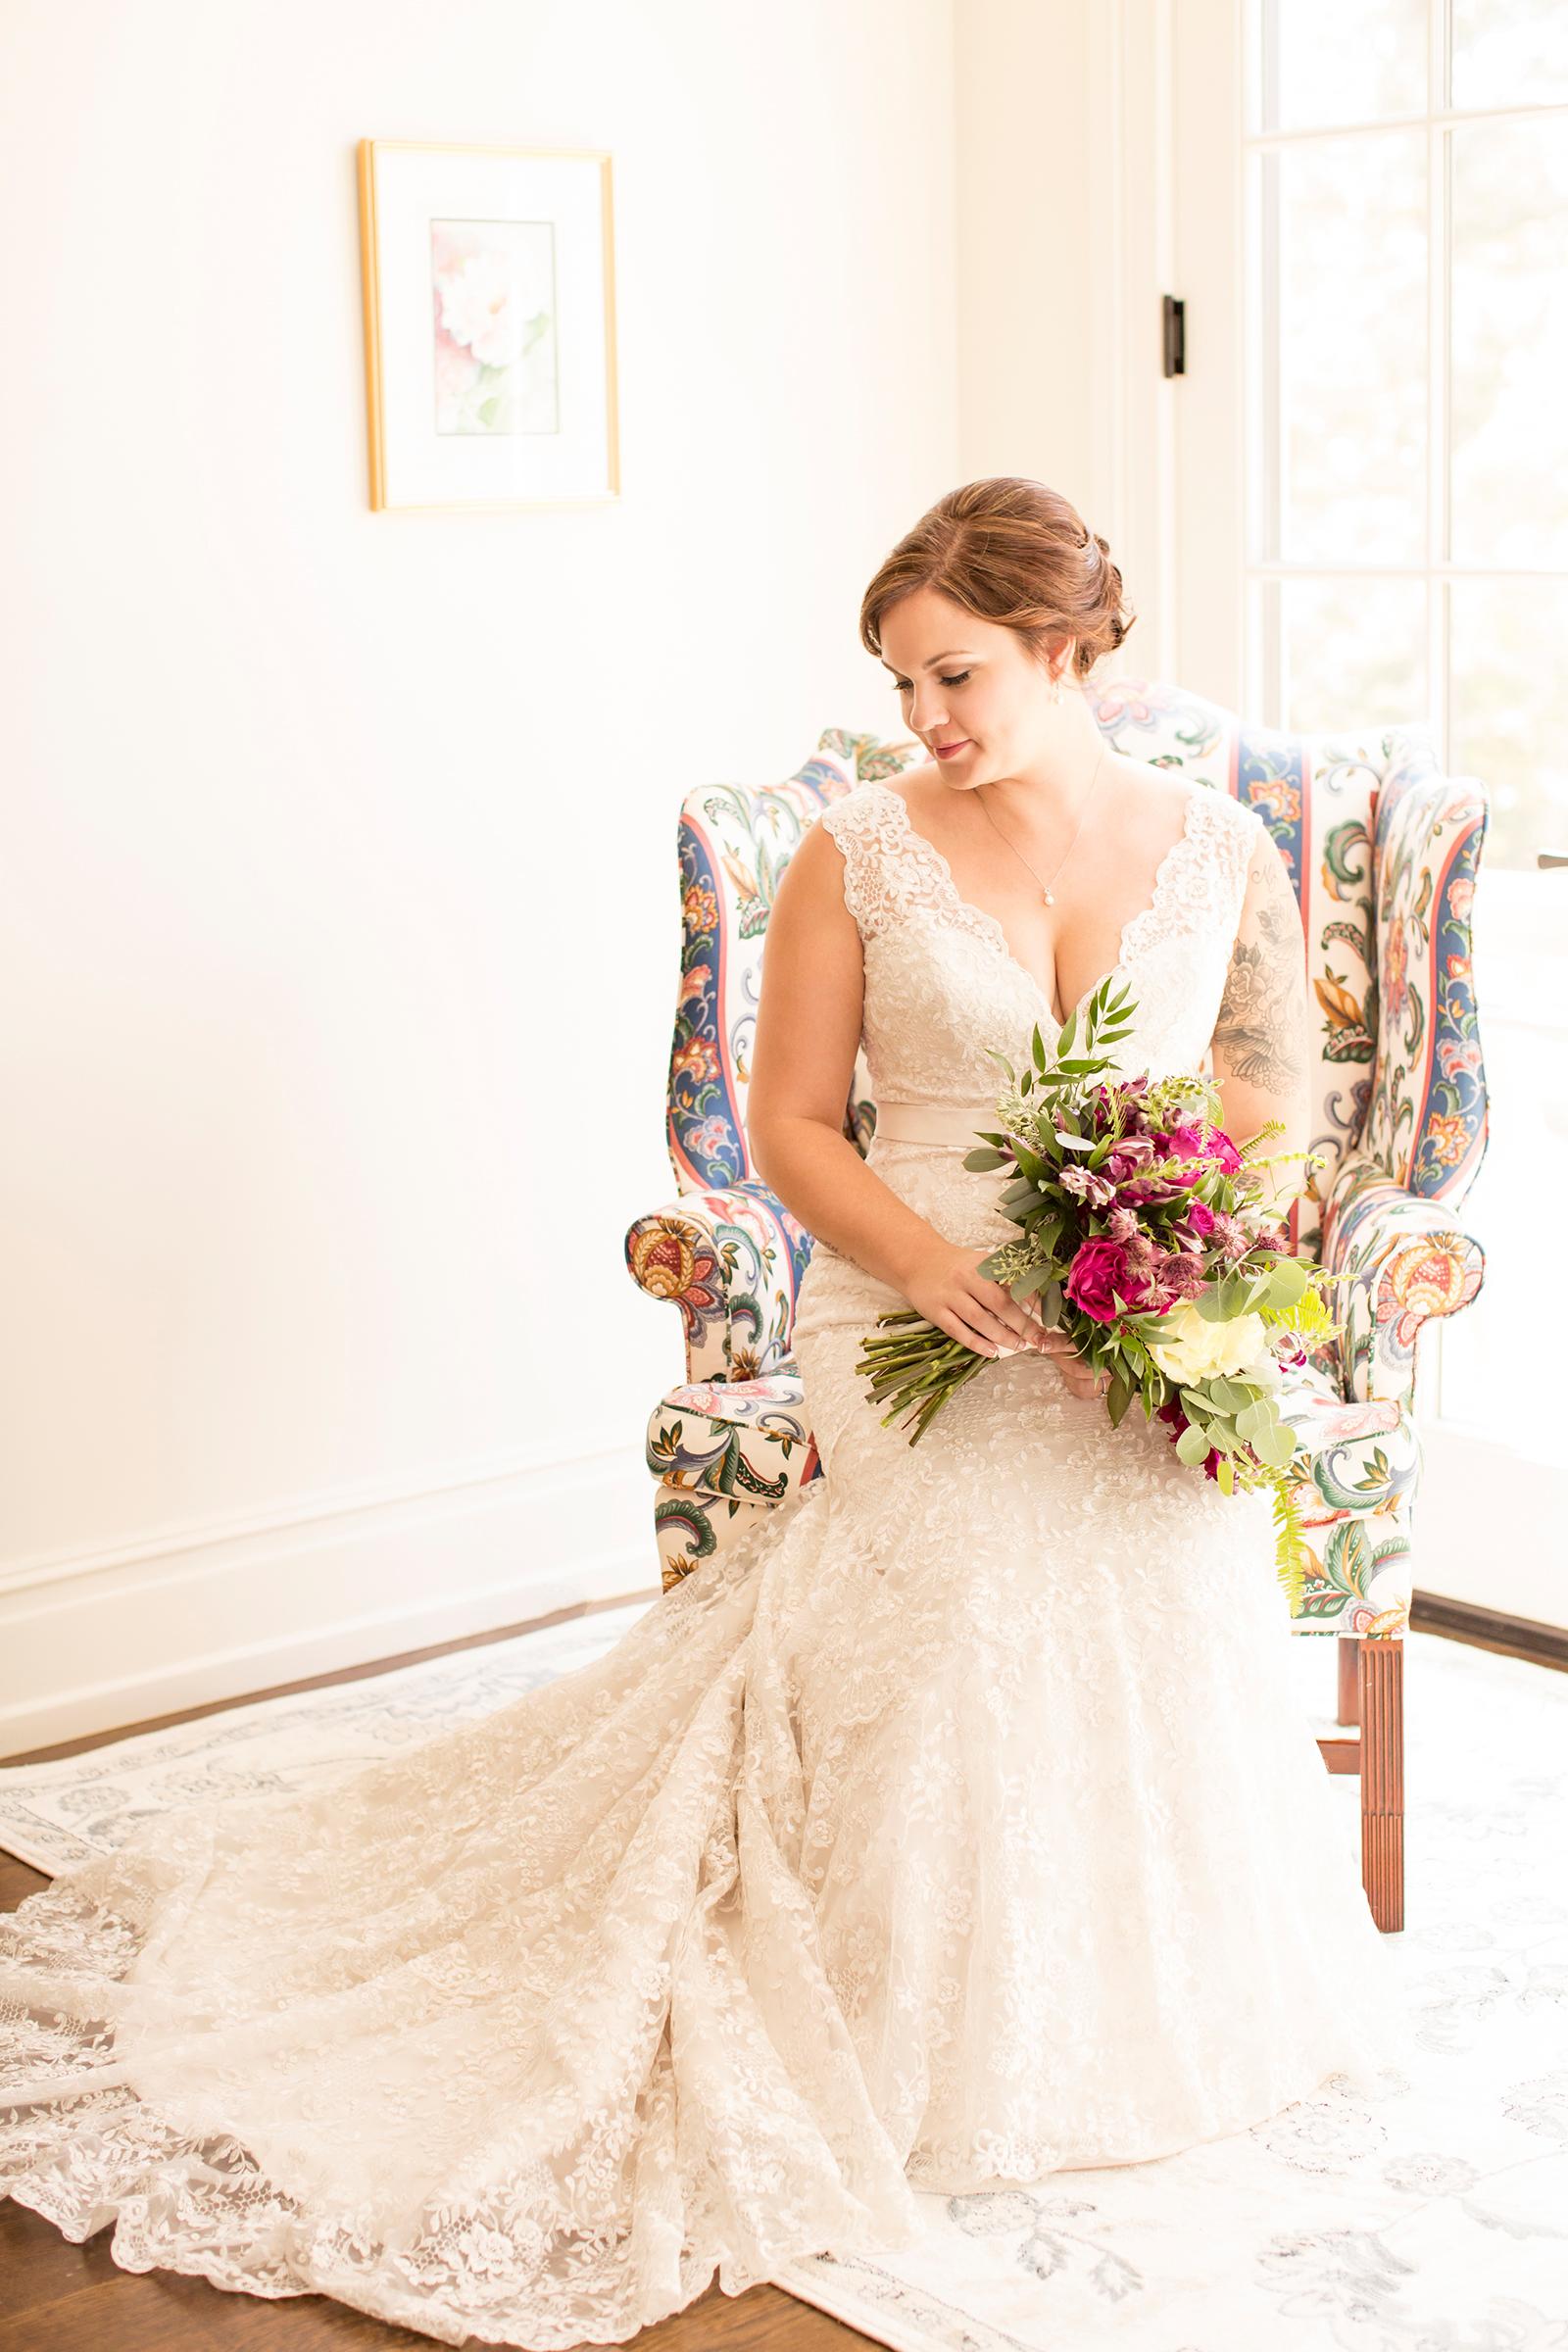 Where to Buy your Wedding Dress | J&D Photo LLC | Richmond, Virginia